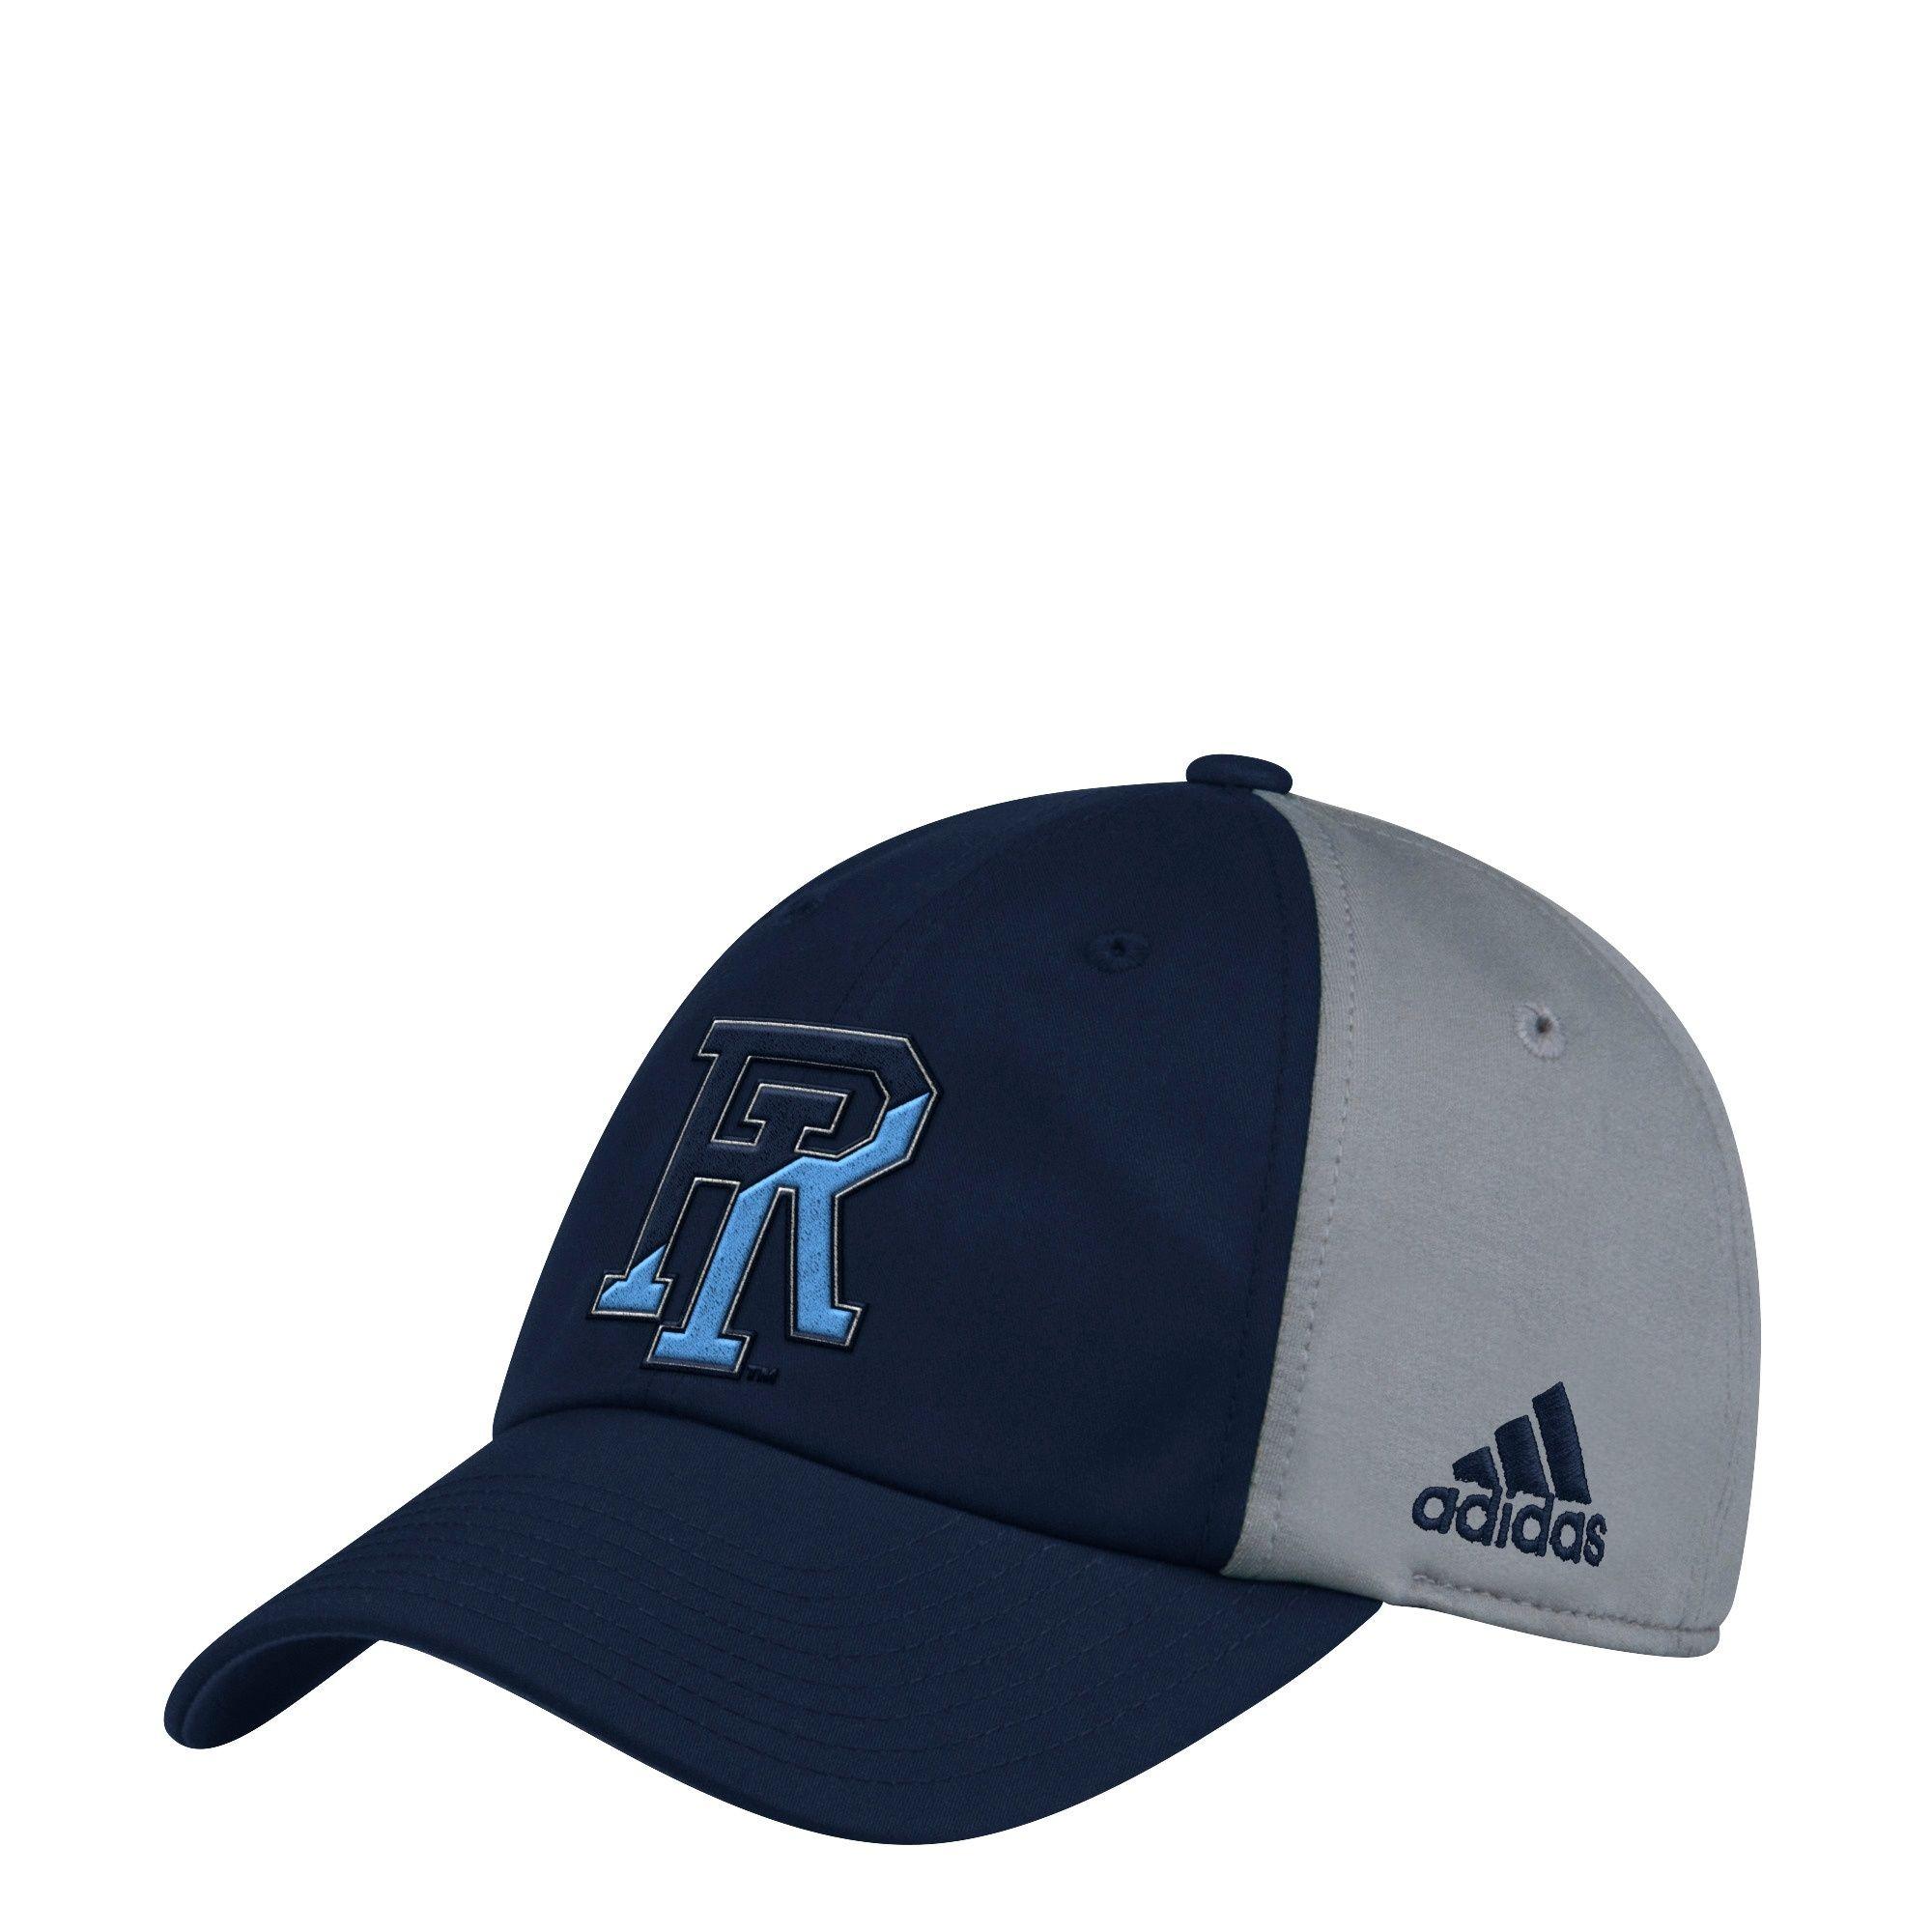 Adidas Adjustable Slouch Cap 8d652de5685